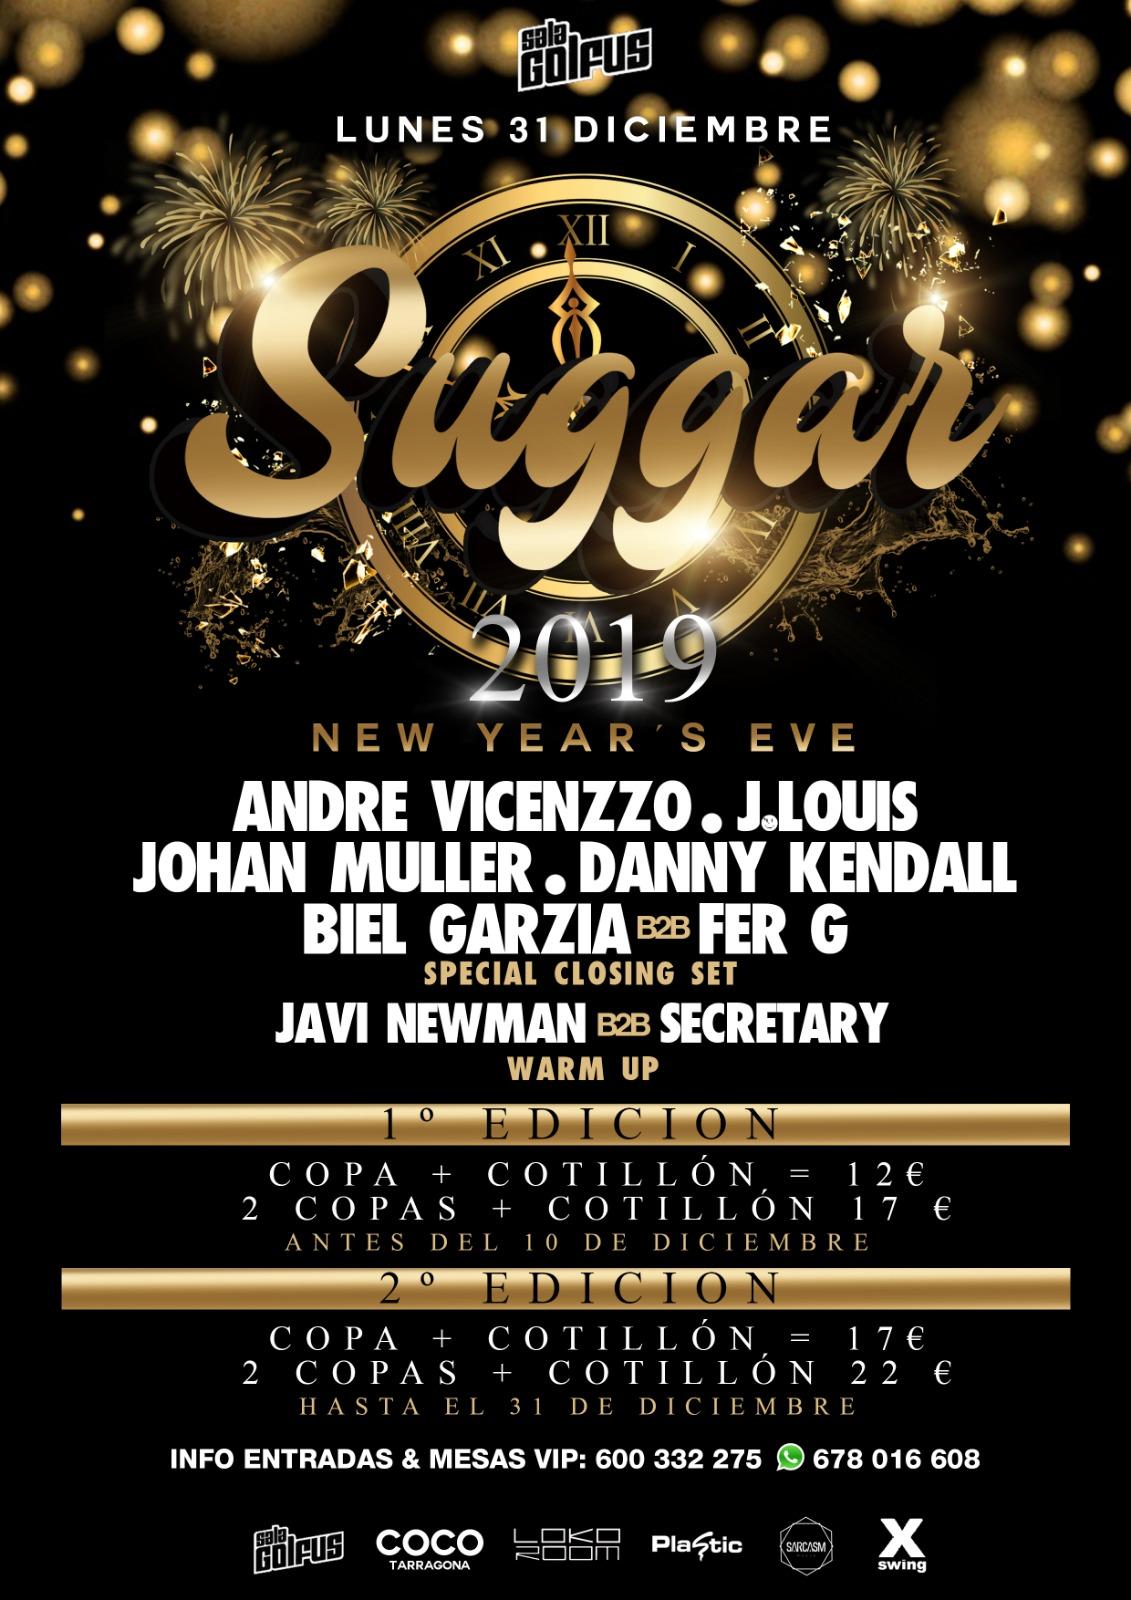 suggar-2019-new-years-eve-5be9627c5b2b1.